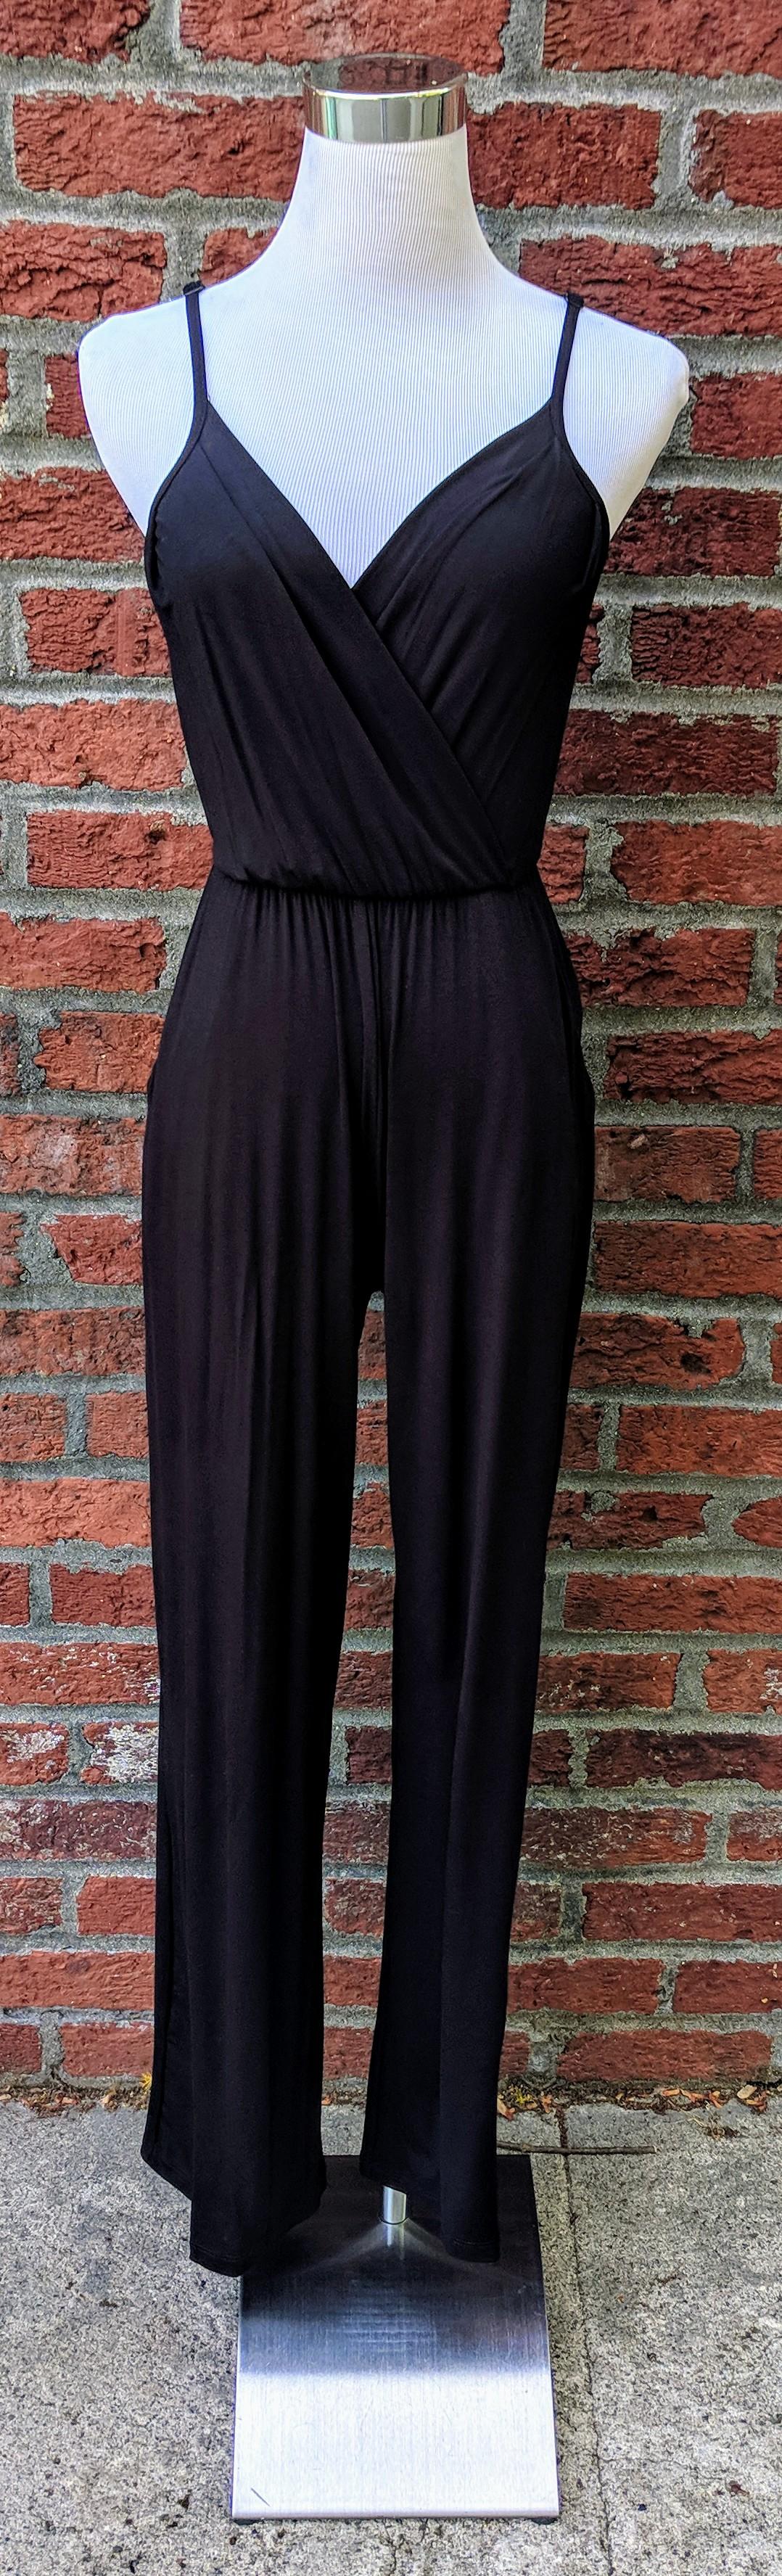 Black jumpsuit with overlapped v-neckline and pockets.